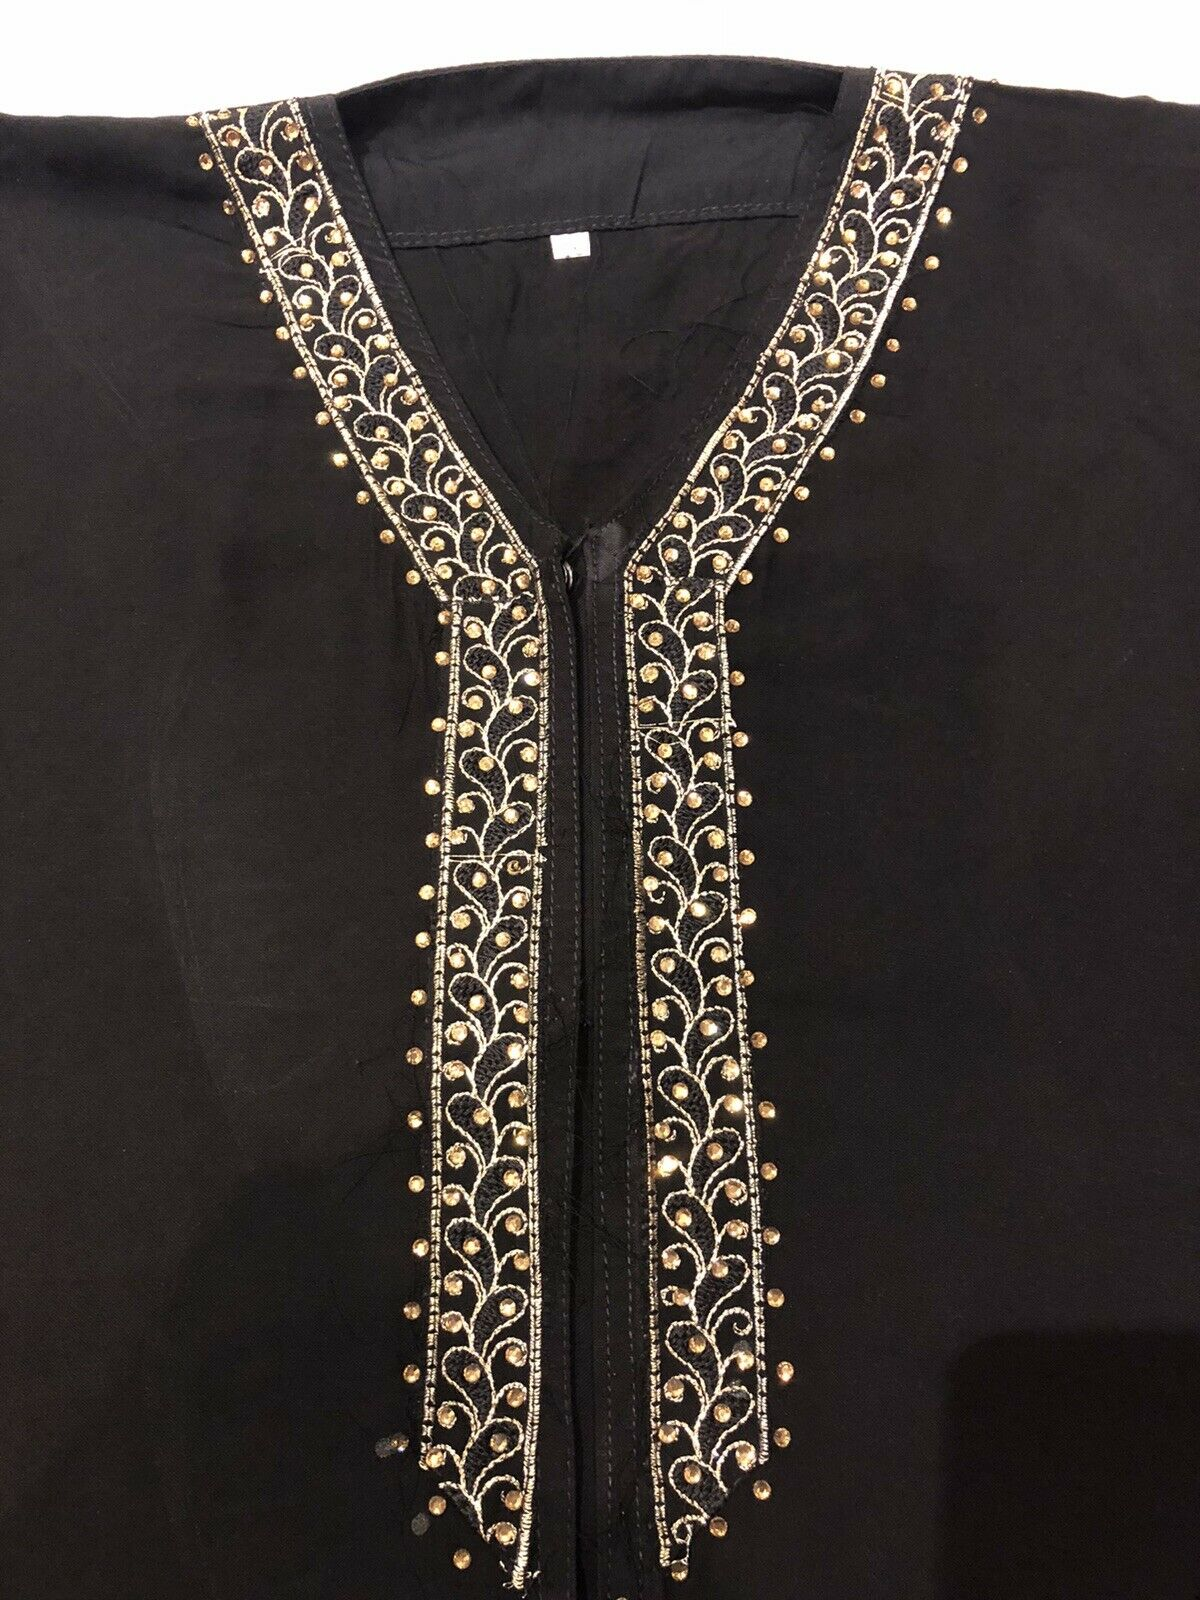 ♾ Girls Black Abaya And Scarf Size 46 Sparkly Gold Embellishments